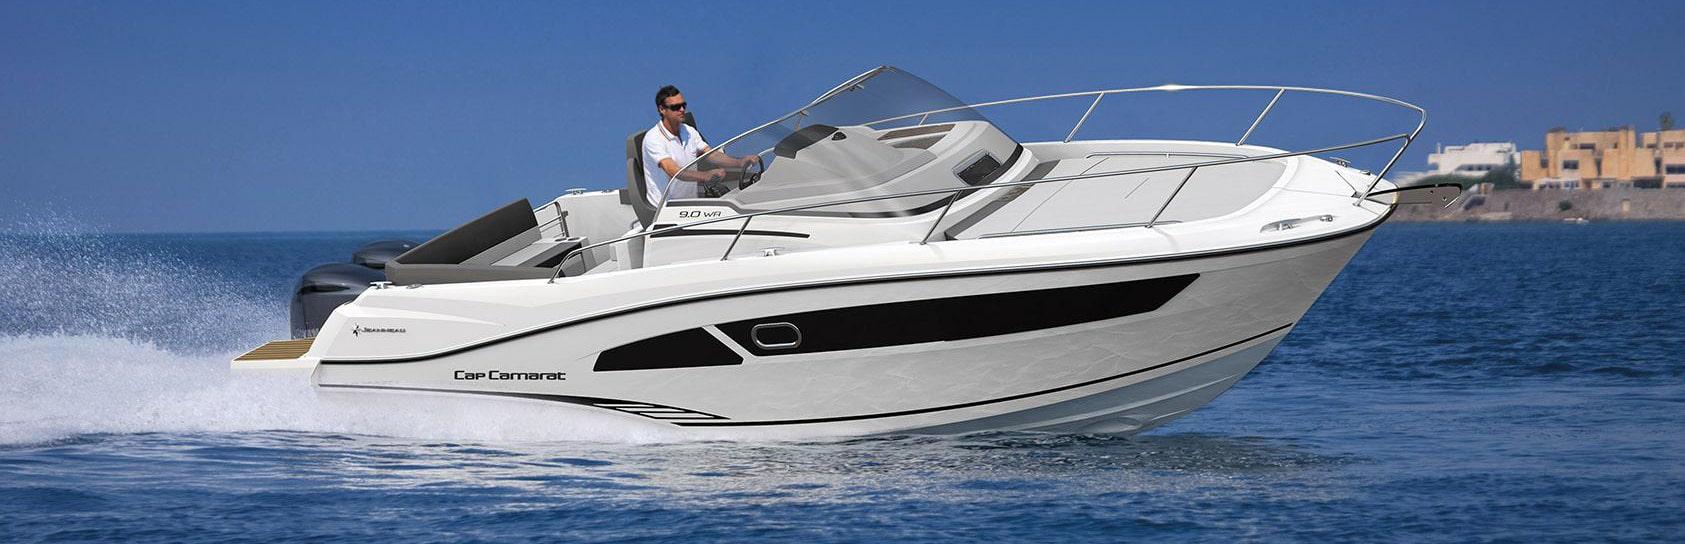 Boating Services Sunsport Marine